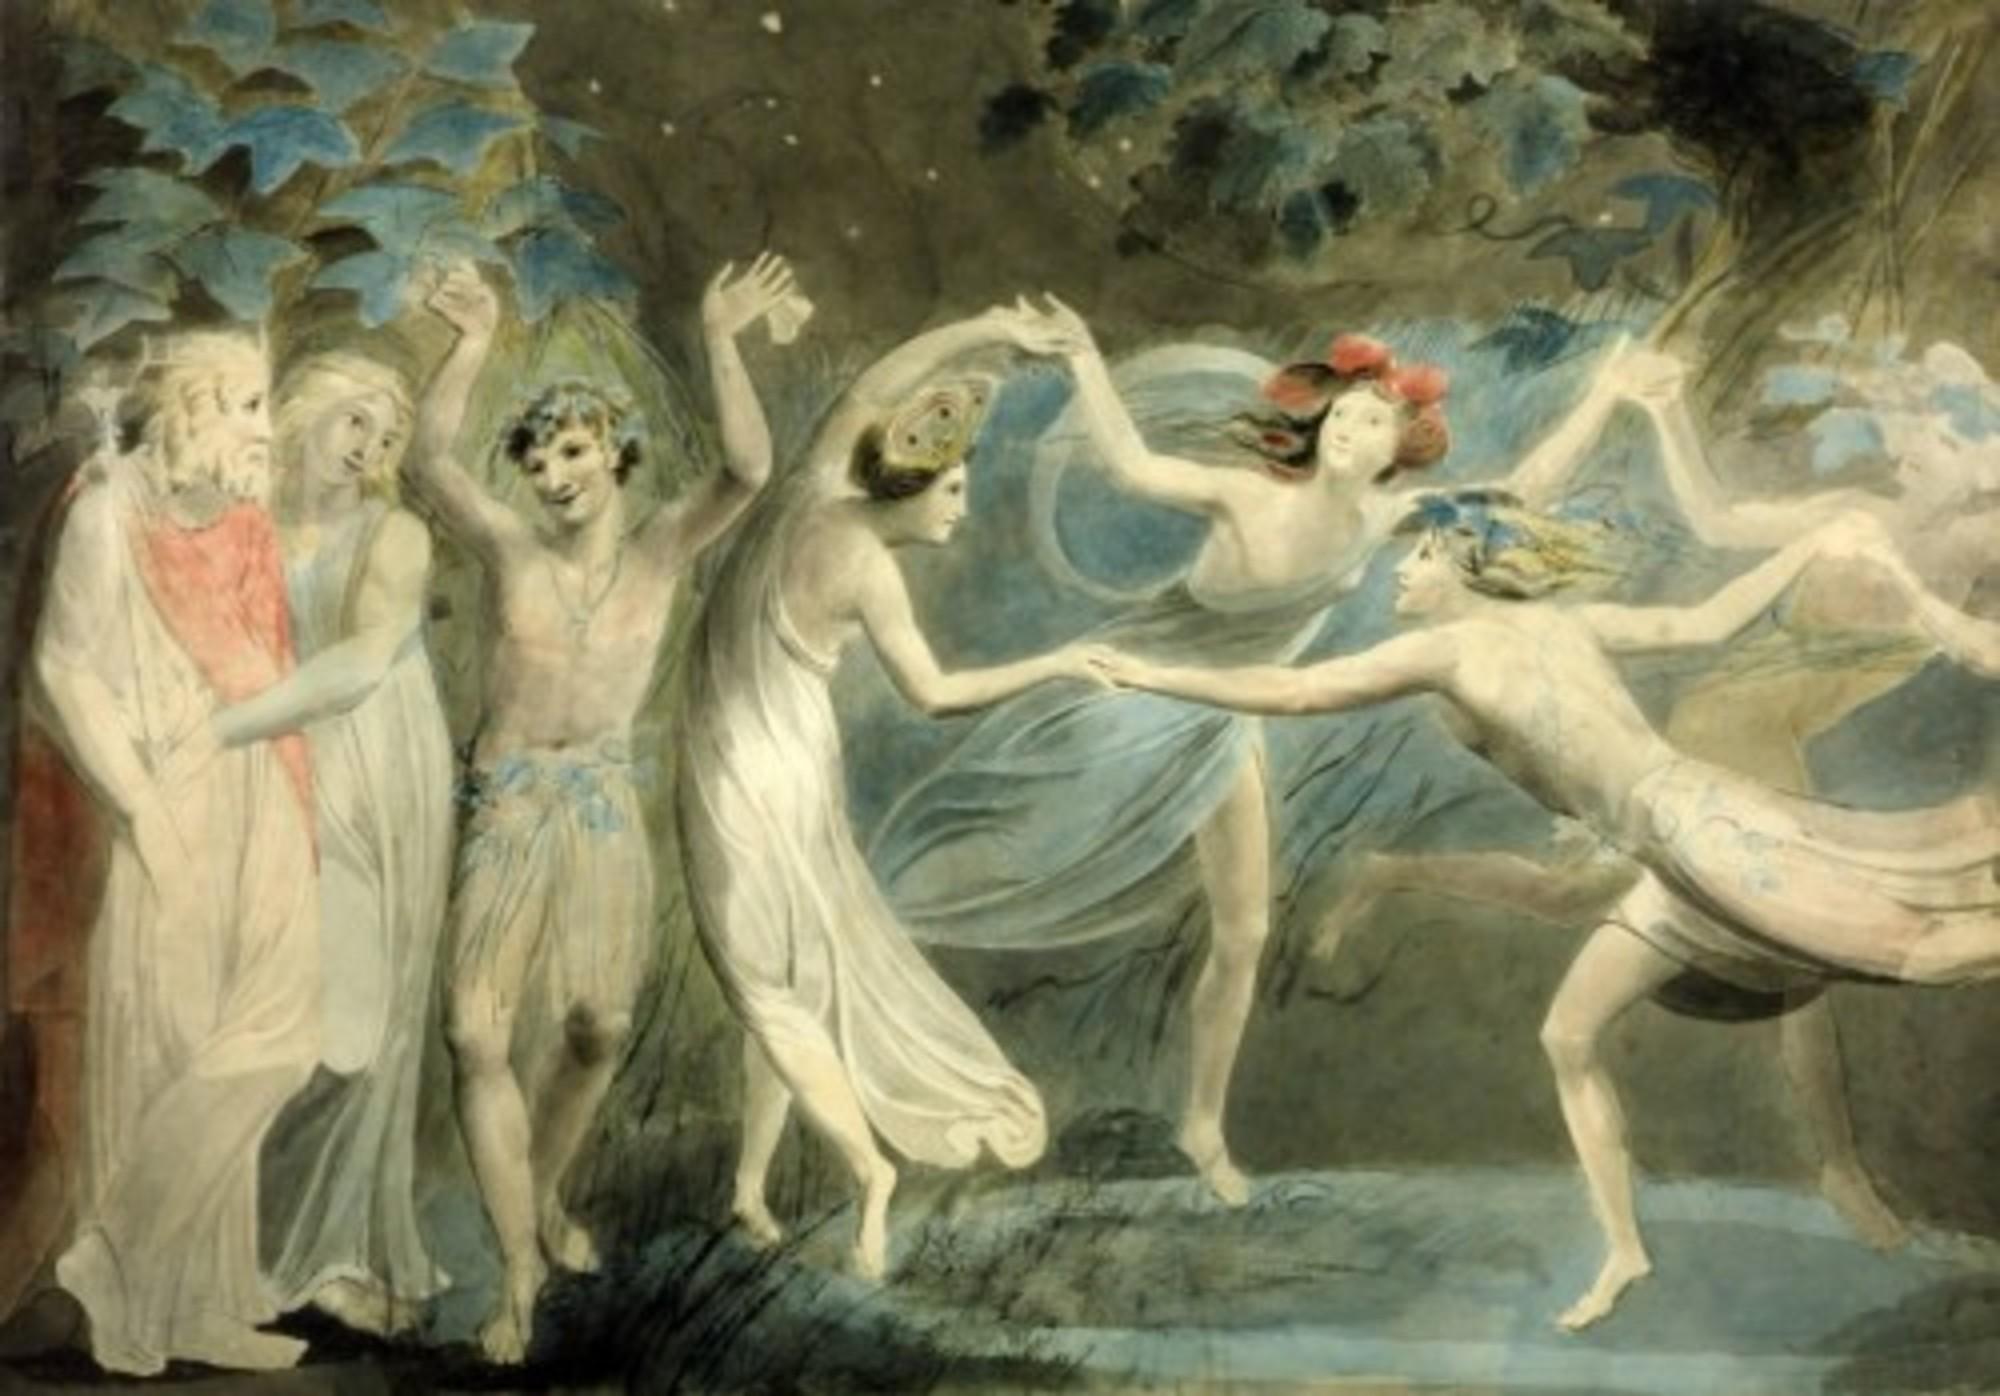 Oberon_Titania_and_Puck_with_Fairies_Dancing._William_Blake._c.1786.jpg